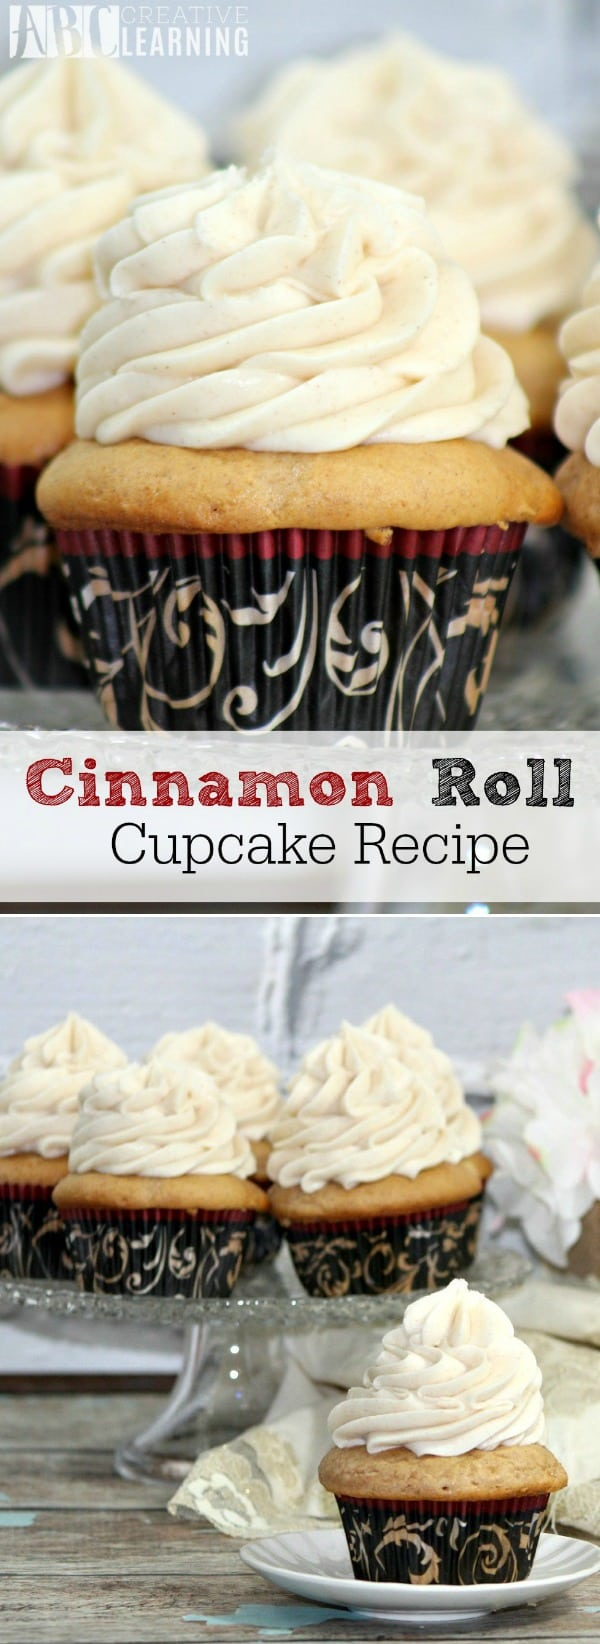 Cinnamon Roll Cupcake Recipe - simplytodaylife.com